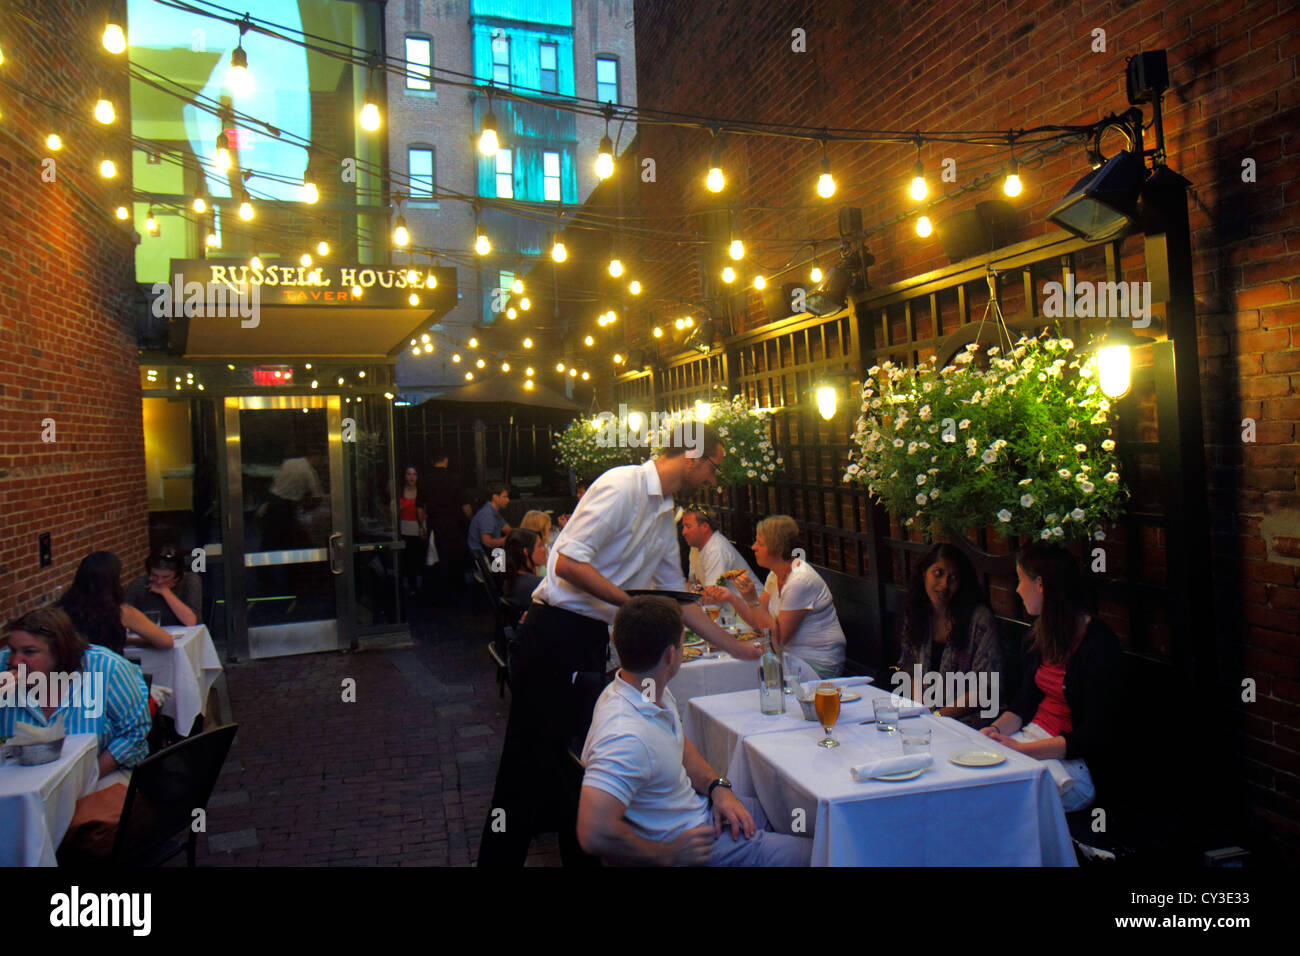 Boston Massachusetts Cambridge Harvard Square Russell House taberna restaurante alfresco camarero de comedor tablas Imagen De Stock